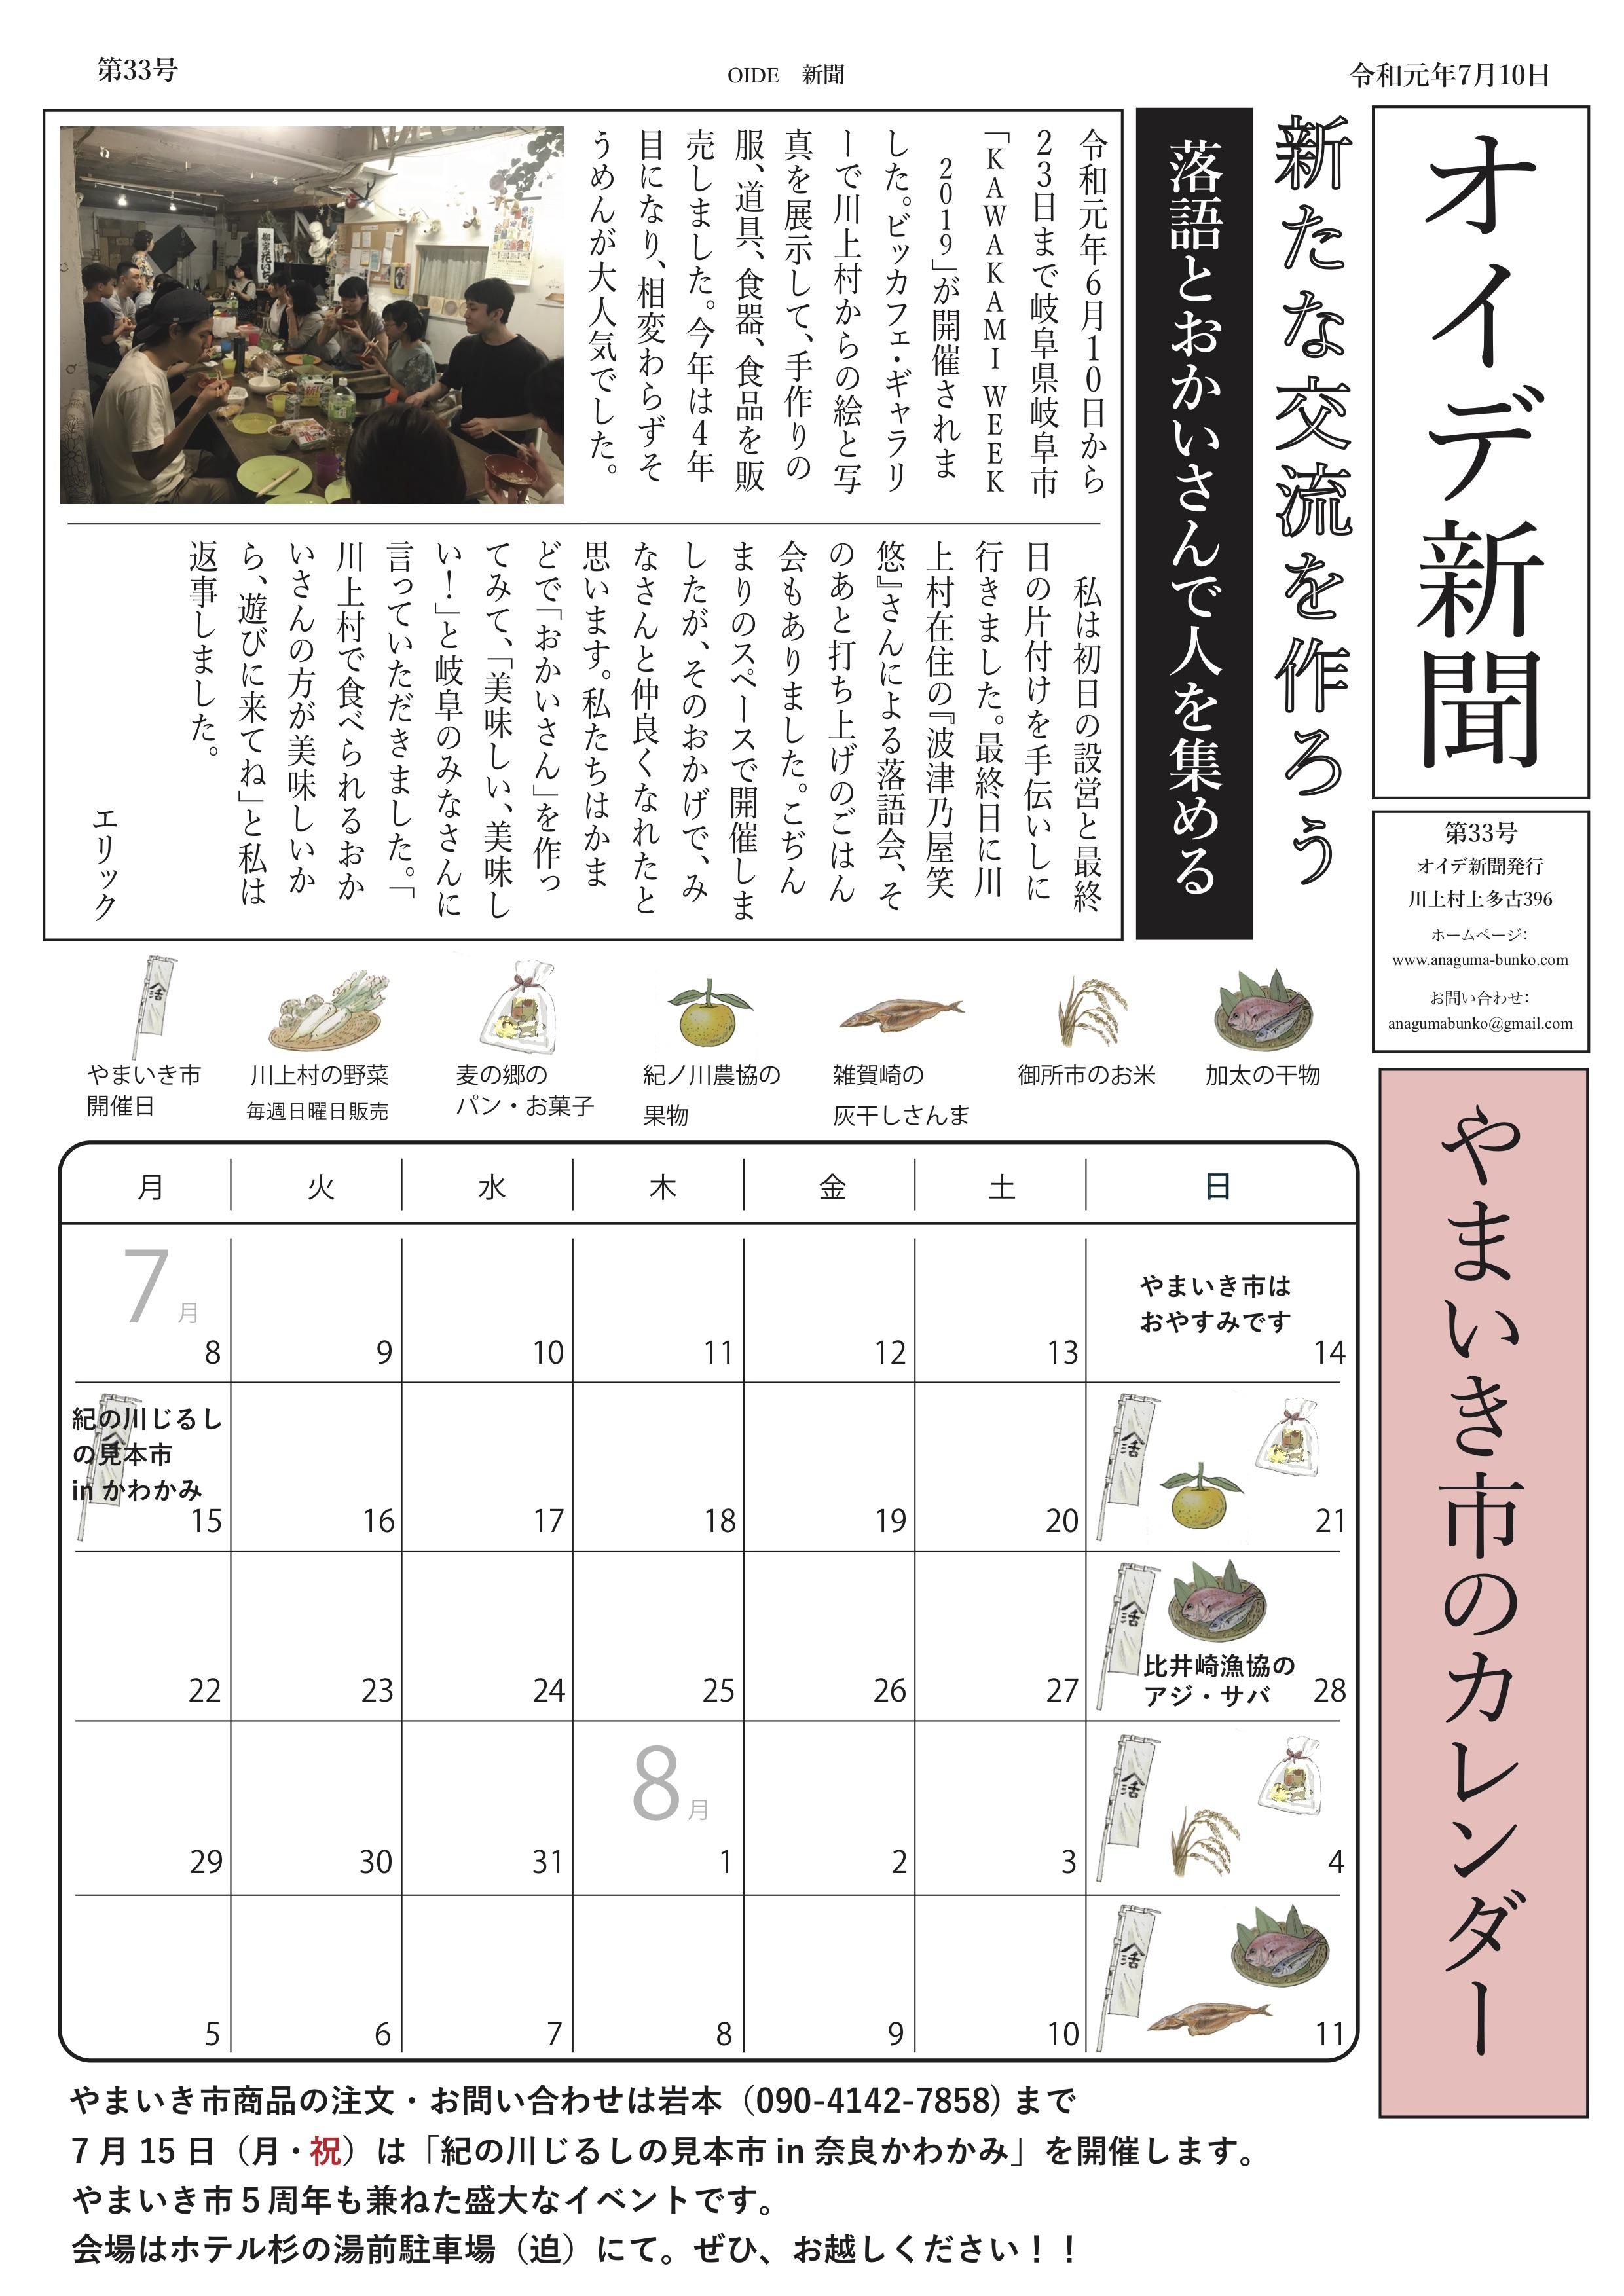 oide新聞令和元年7月号表.jpg